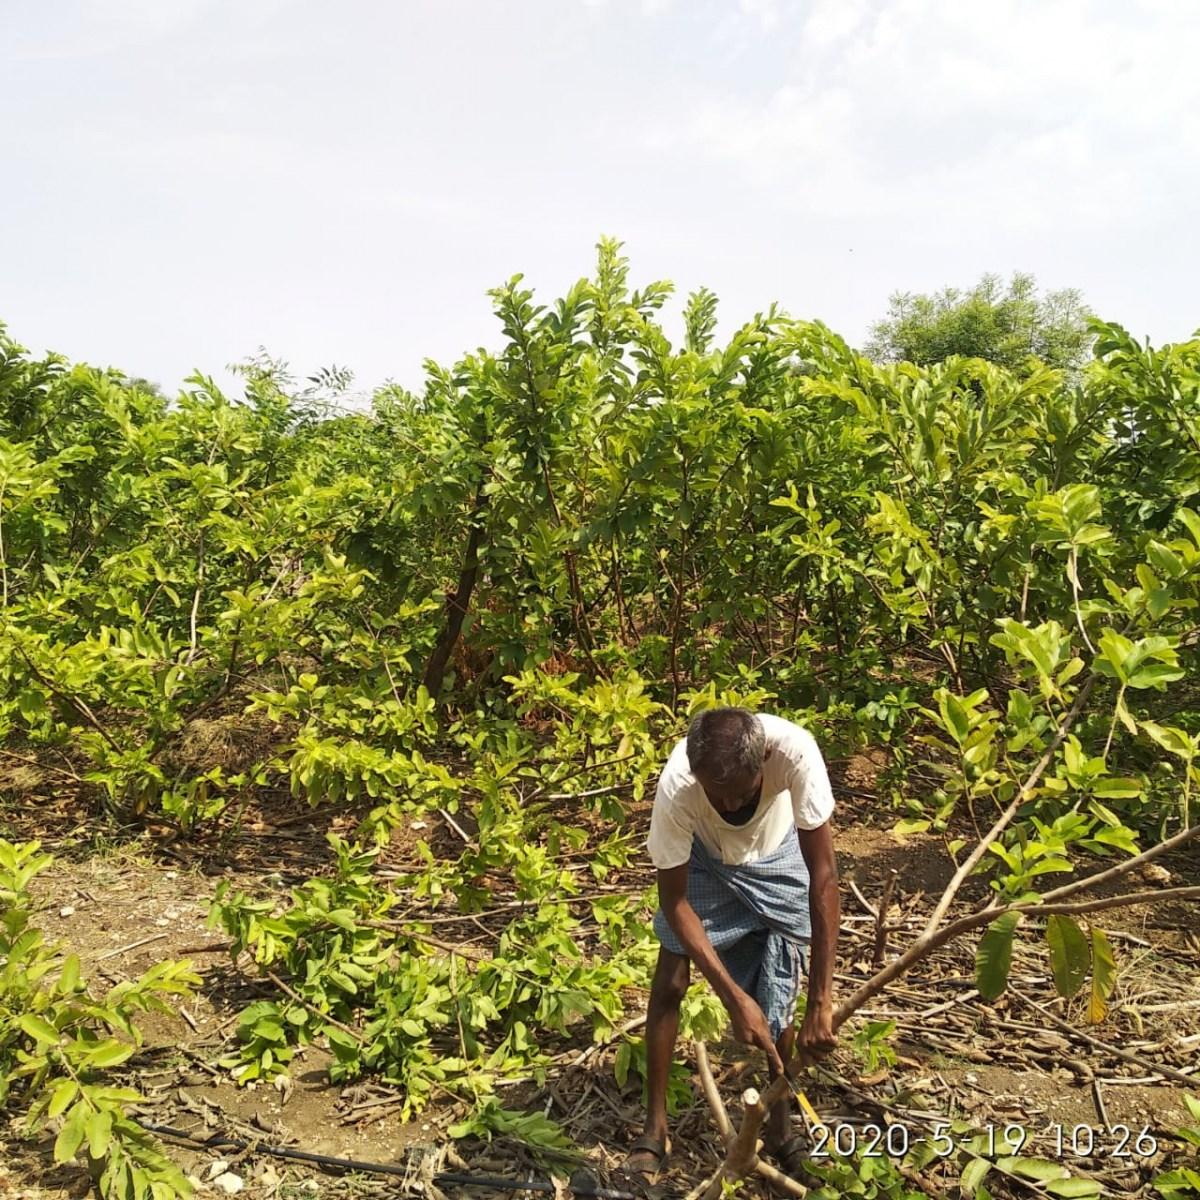 Plant preparation DEAL farm Mevundi Gadag district five. May 21, 2020. 11:31